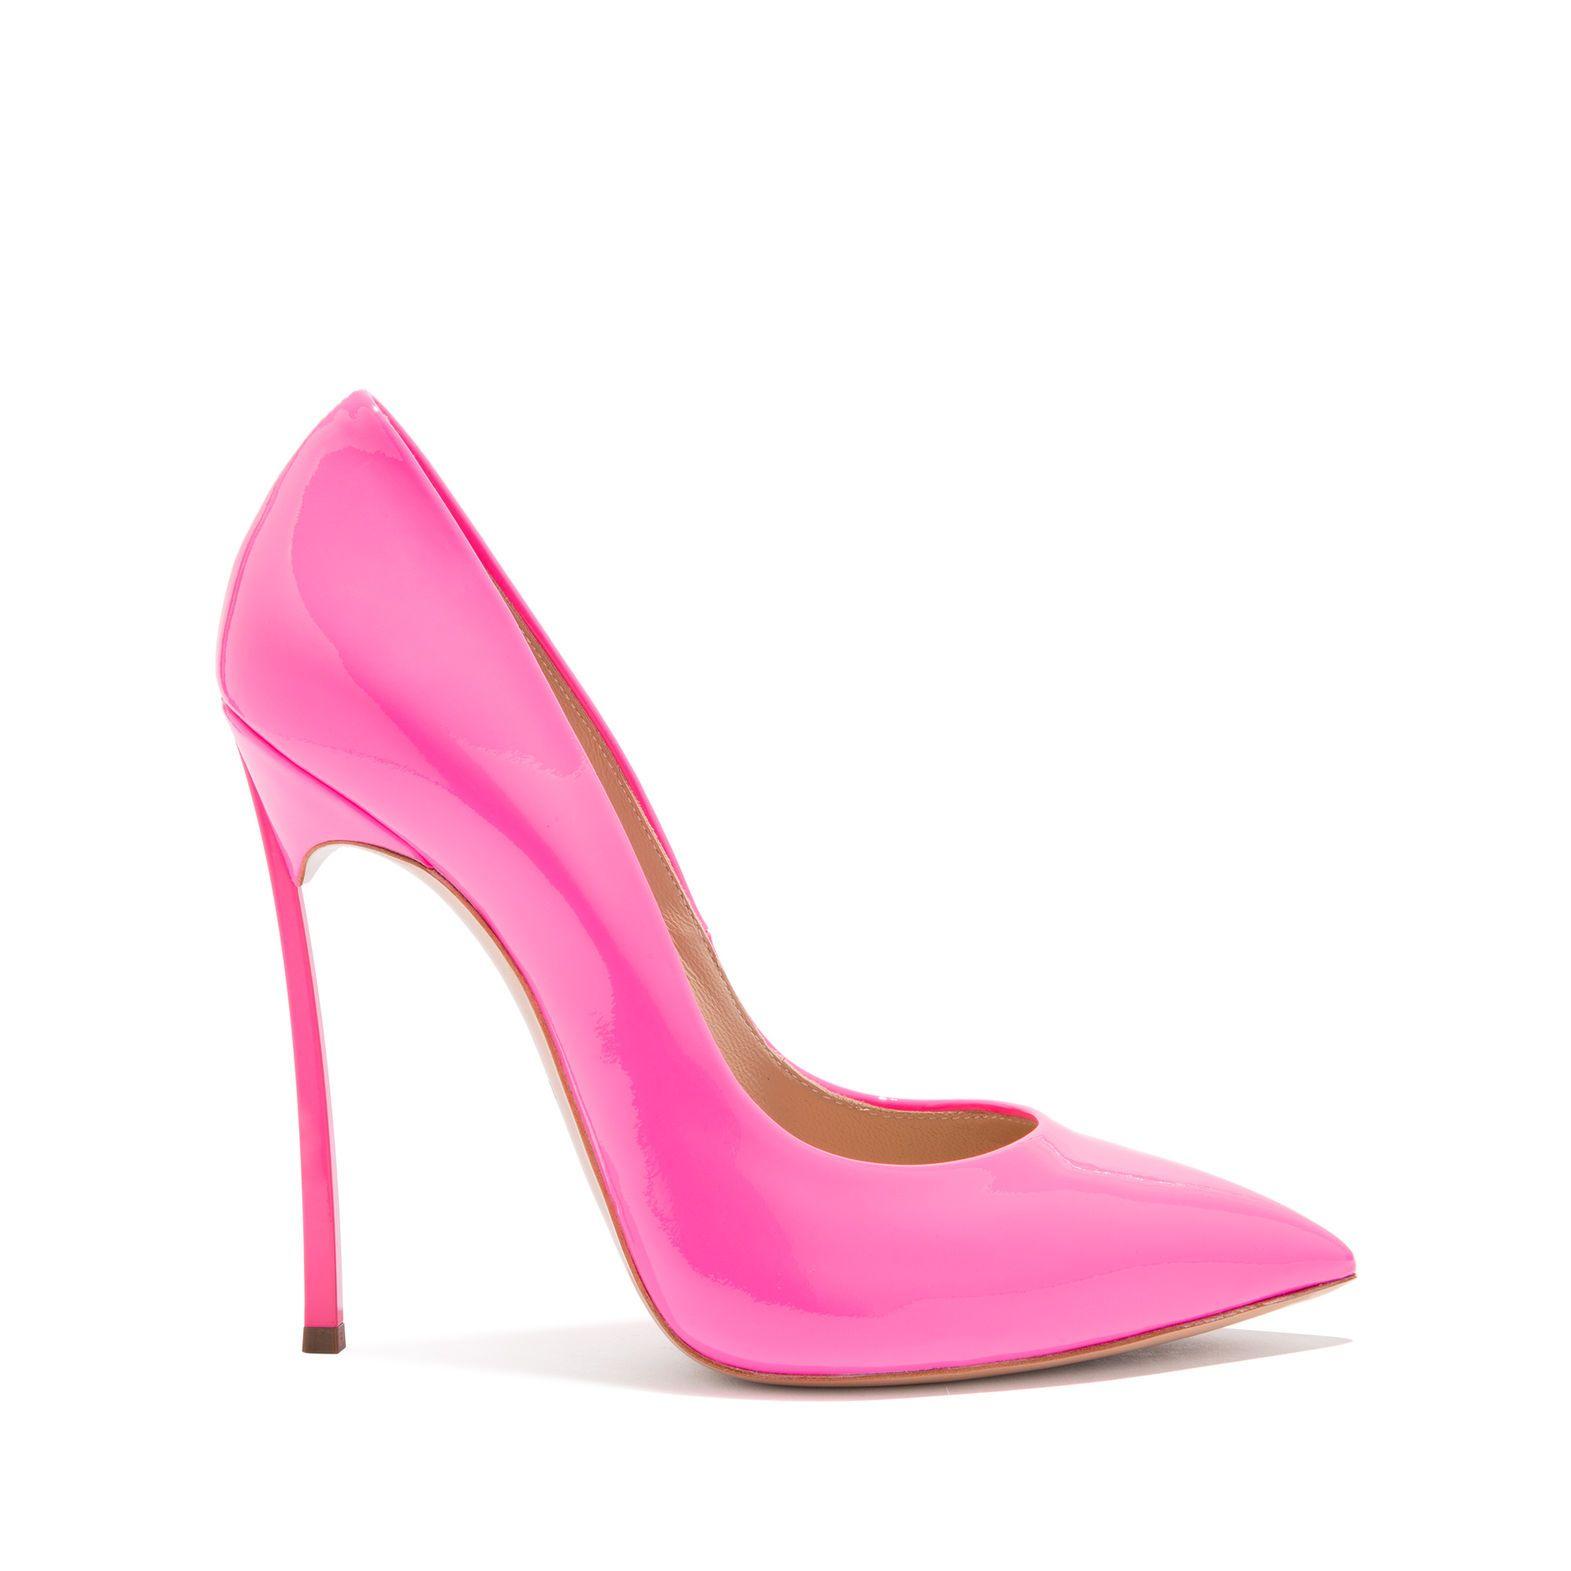 045d2ed017 Casadei Women's Designer and Luxury Pumps | Casadei - Blade Fluo in ...